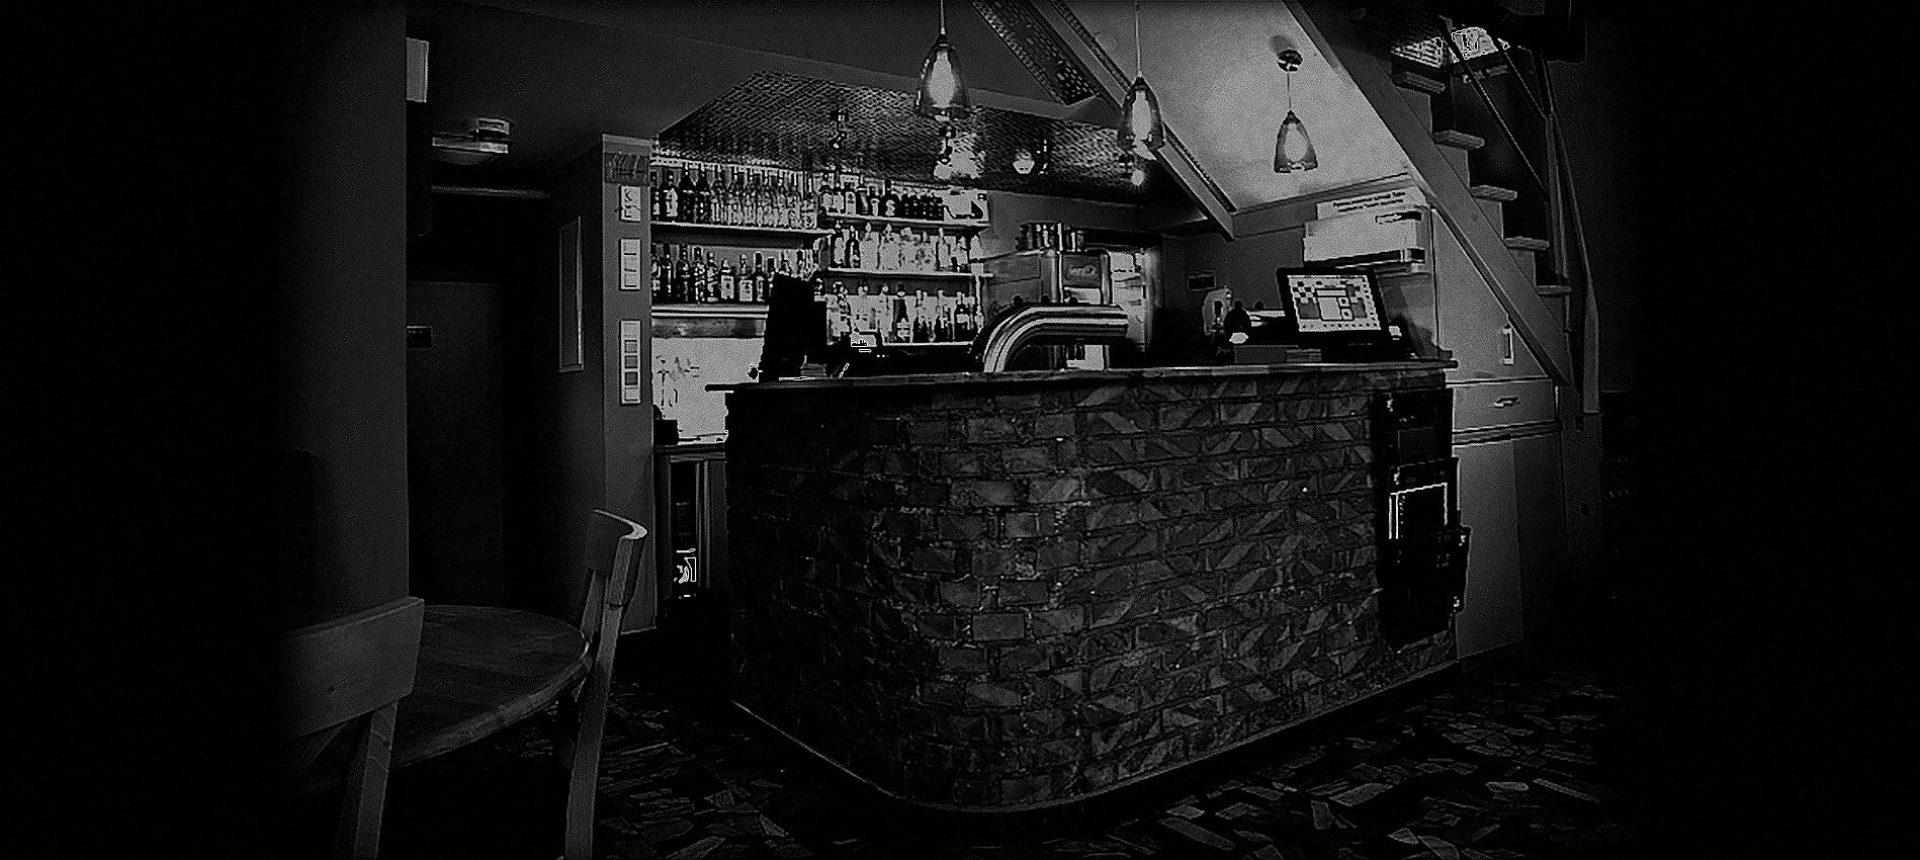 Browar Piwna Gdańsk Mini Browar I Restauracja